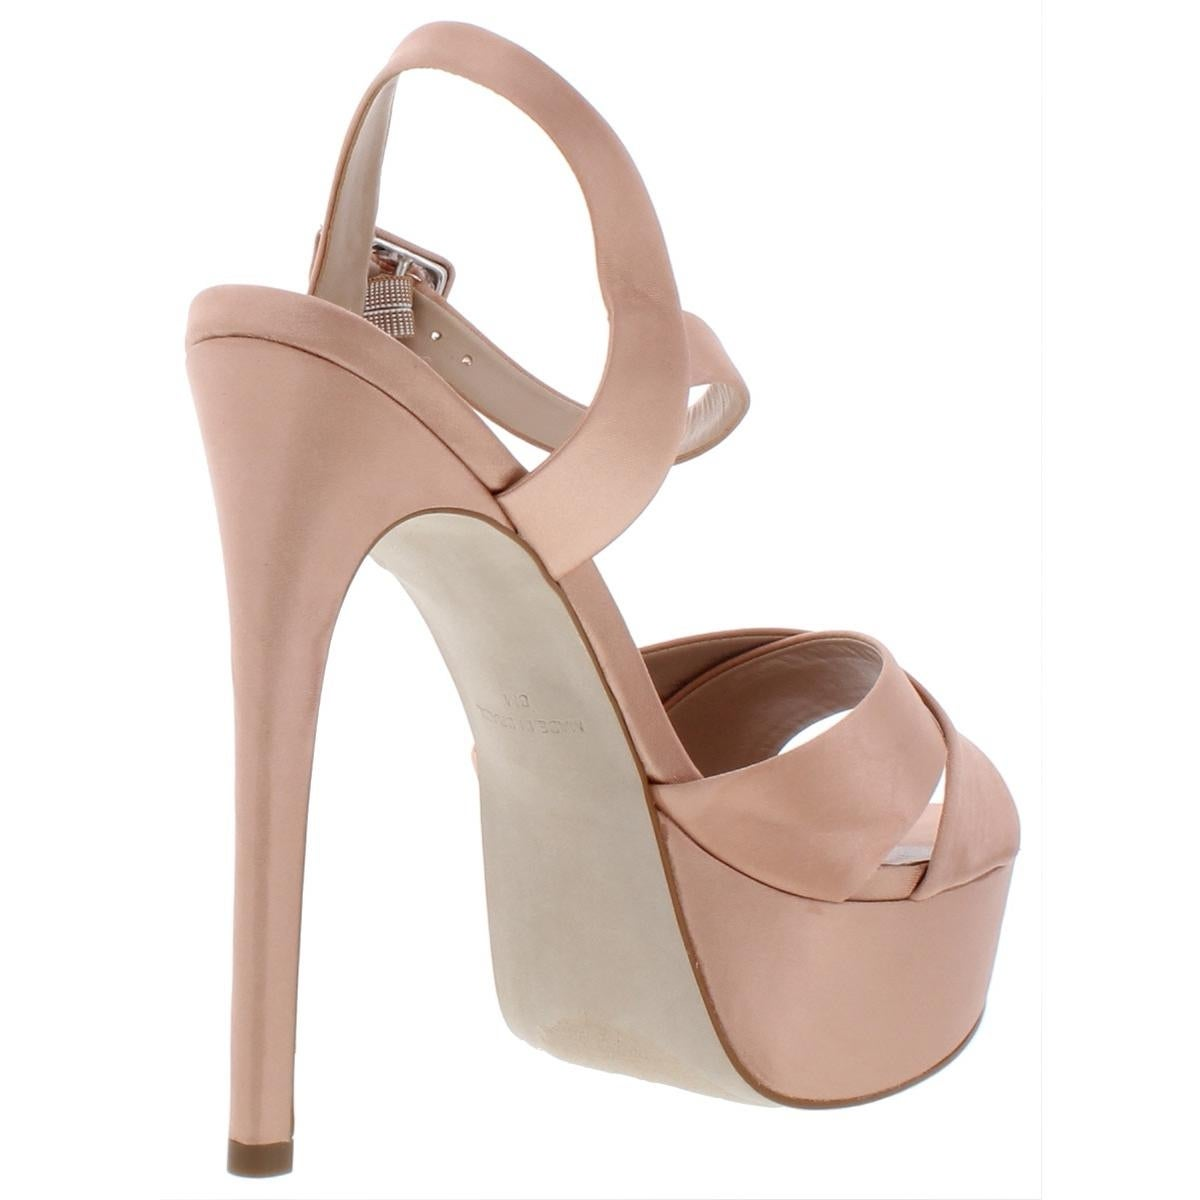 f971502ffc6 Shop Steve Madden Womens Smitten Platform Heels Glitter Stiletto - Free  Shipping Today - Overstock - 27809586